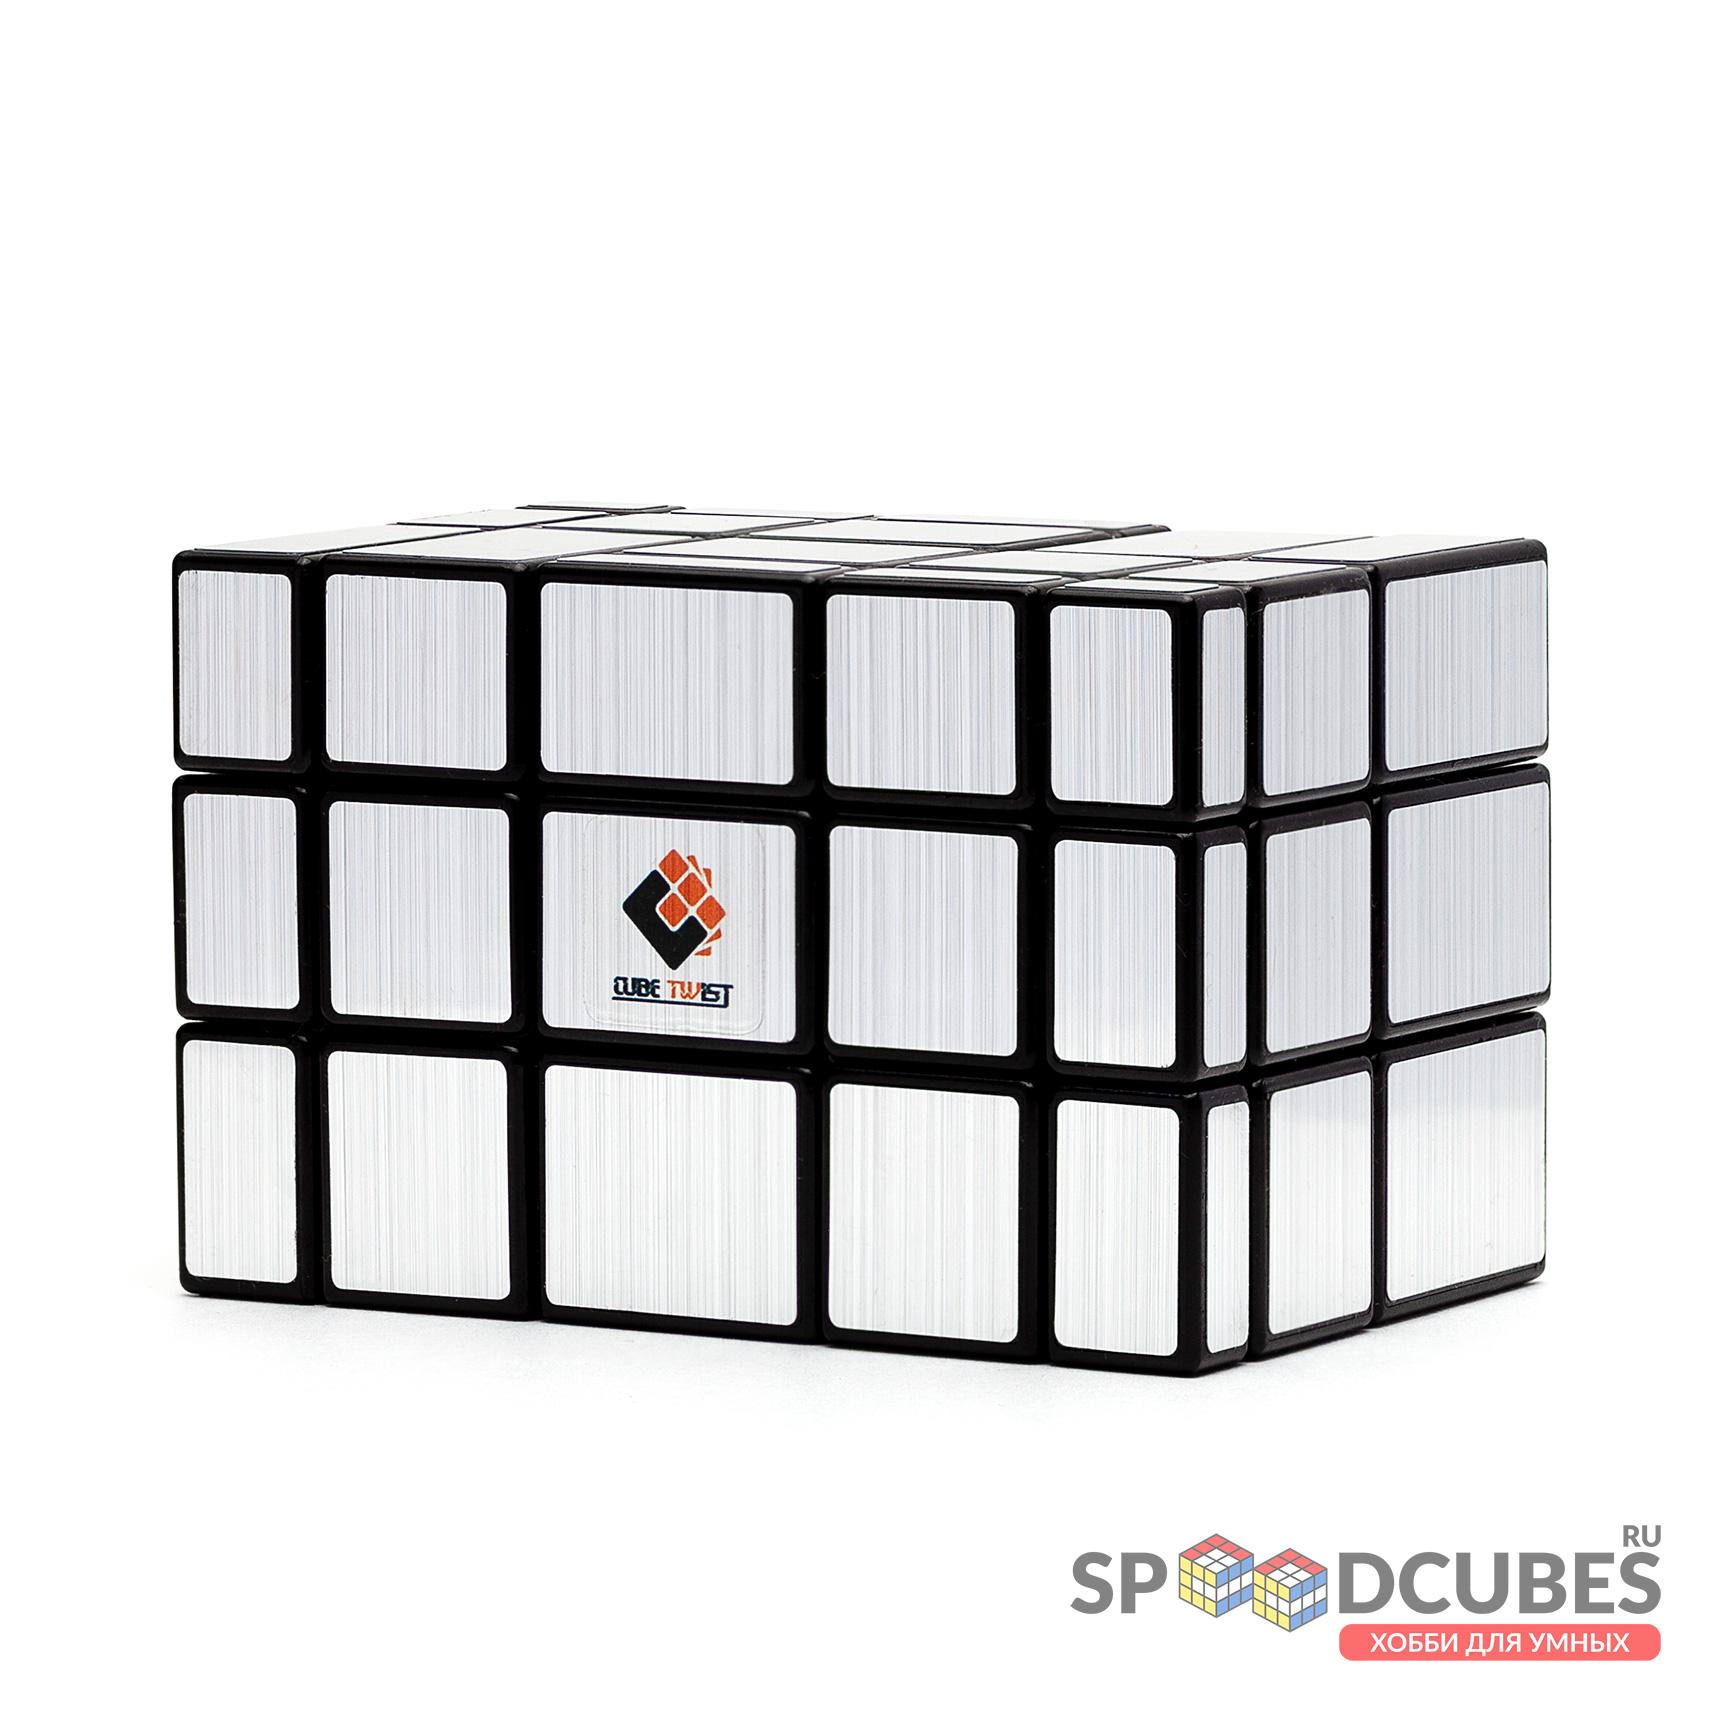 CubeTwist Mirror 3x3x5 Double Cube